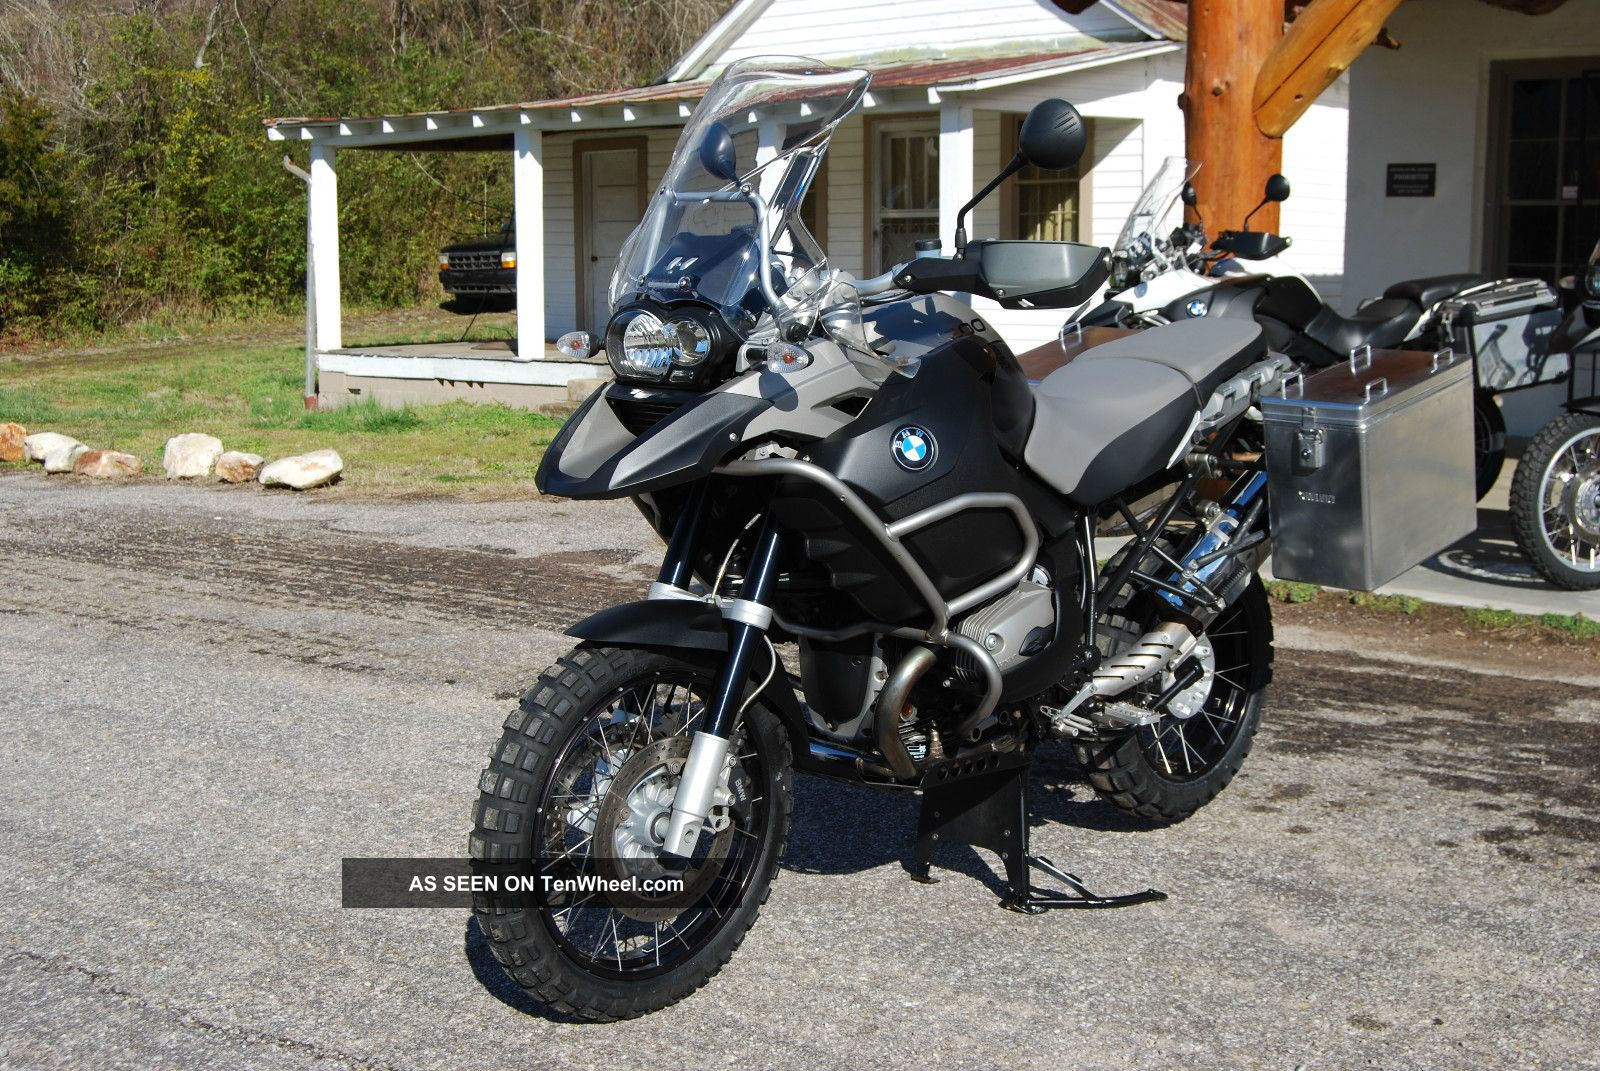 2008 Bmw R1200gs Adventure R1200 Gs Gsa R 1200 -, Loaded Adv